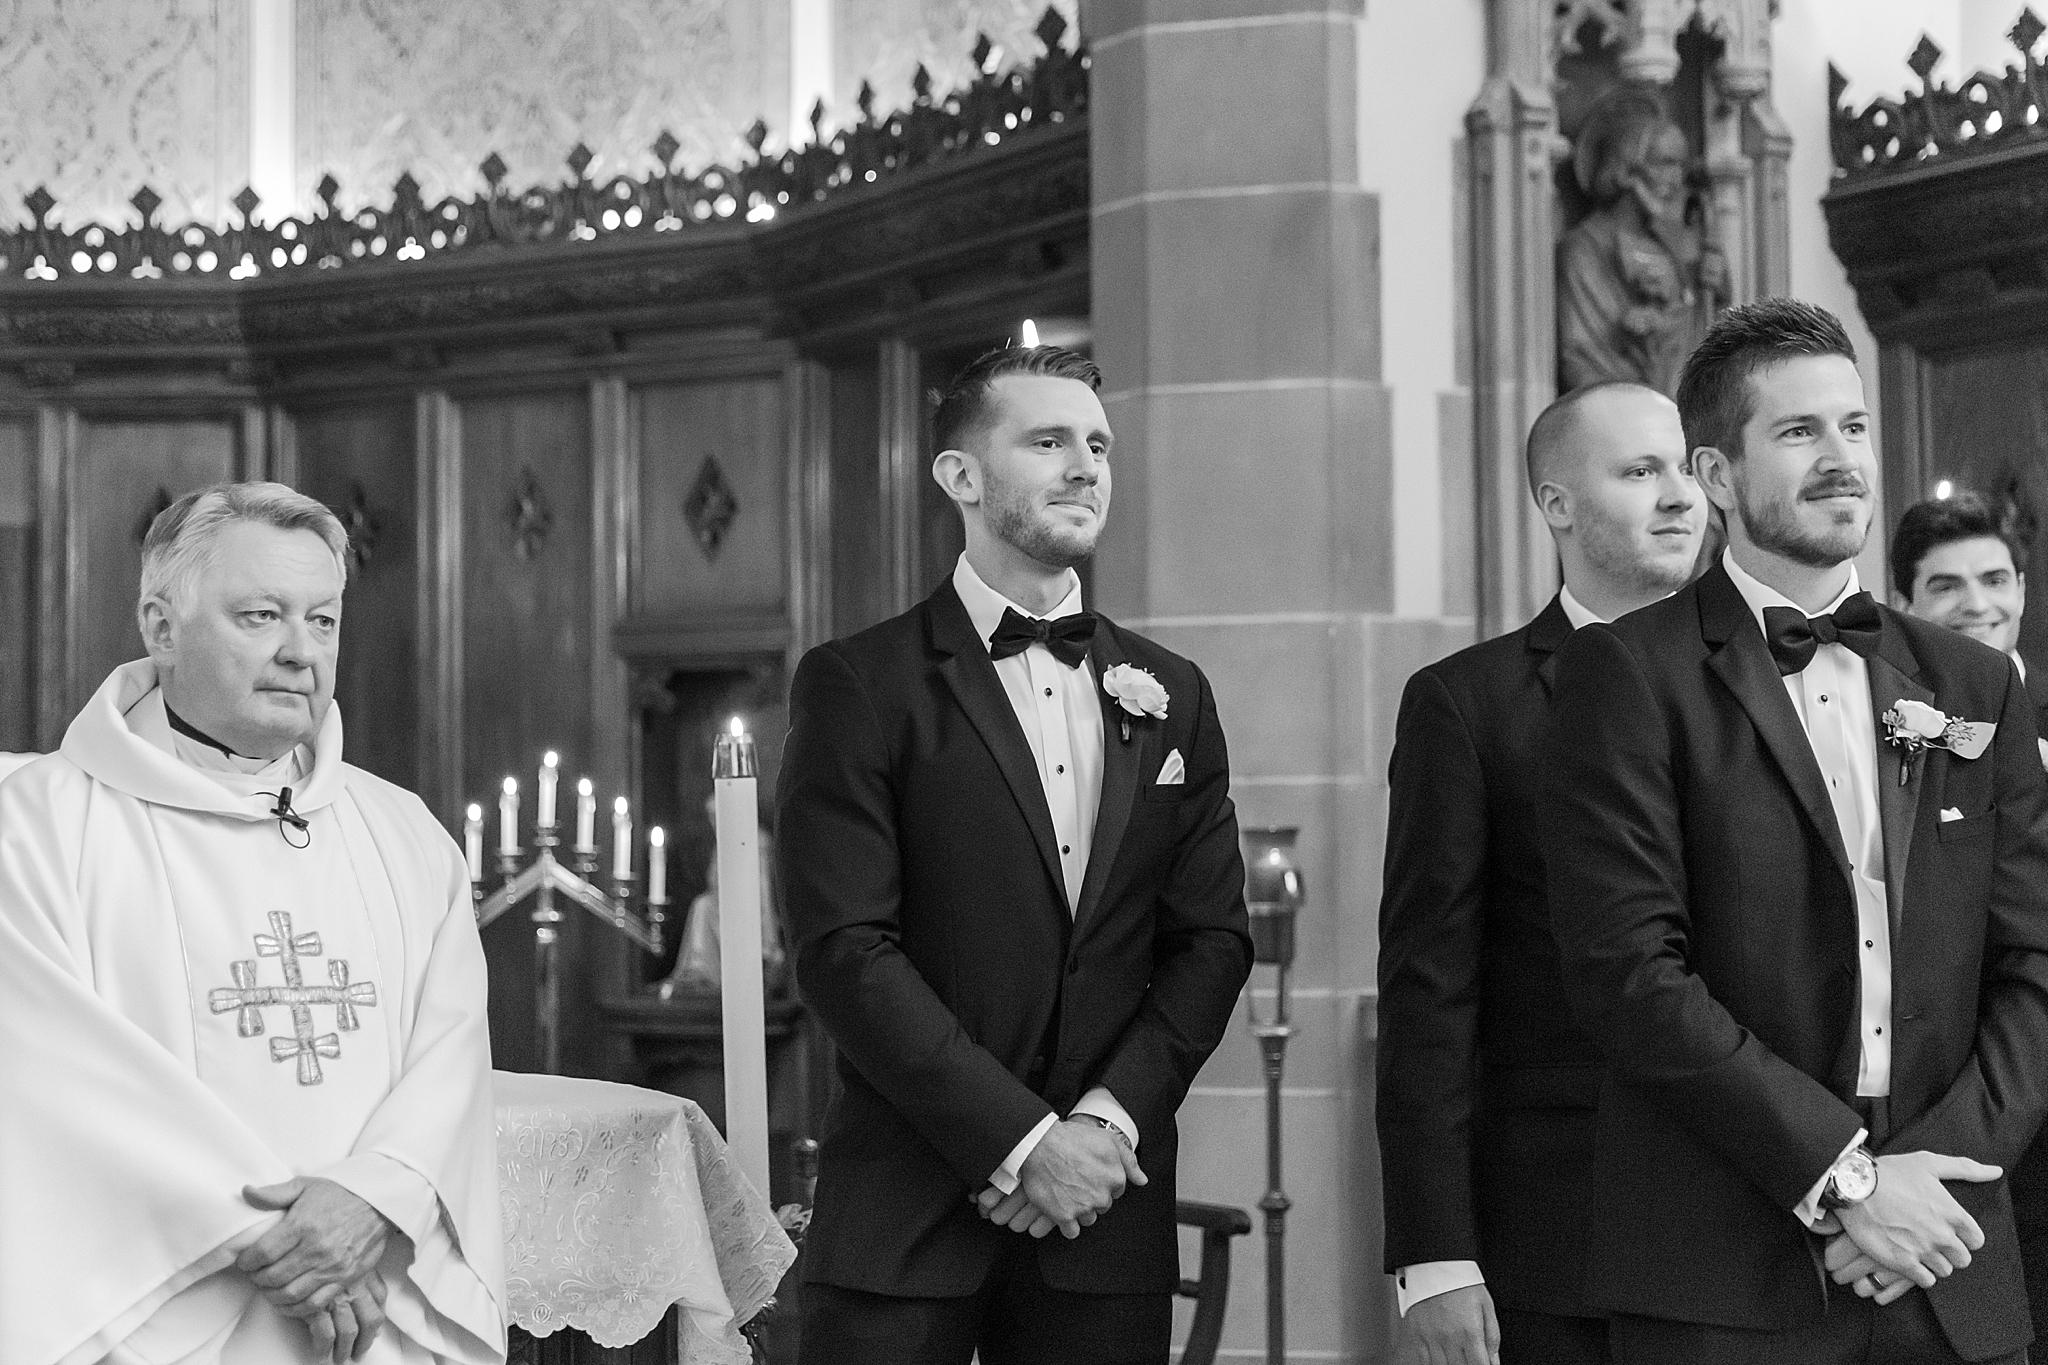 detroit-wedding-photographer-grosse-pointe-academy-chapel-detroit-golf-club-wedding-carly-matt-by-courtney-carolyn-photography_0035.jpg